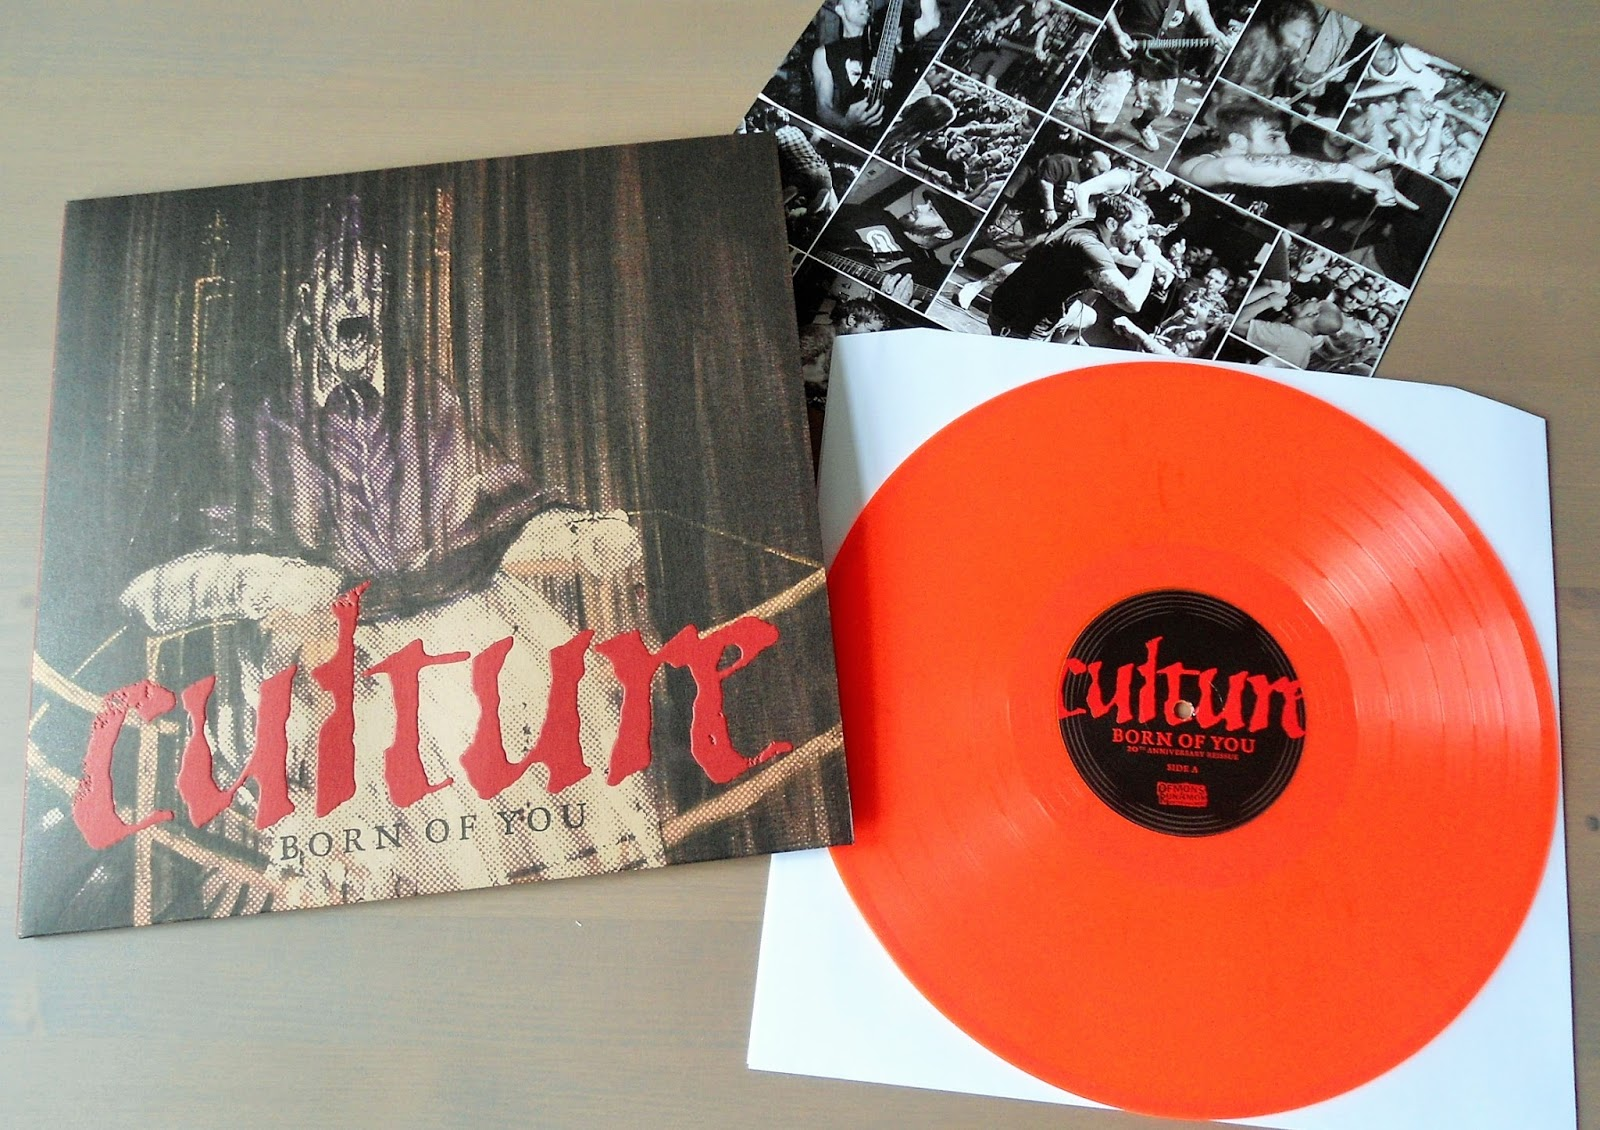 hardcore/metal vinyl: culture - born of you 20th anniversary